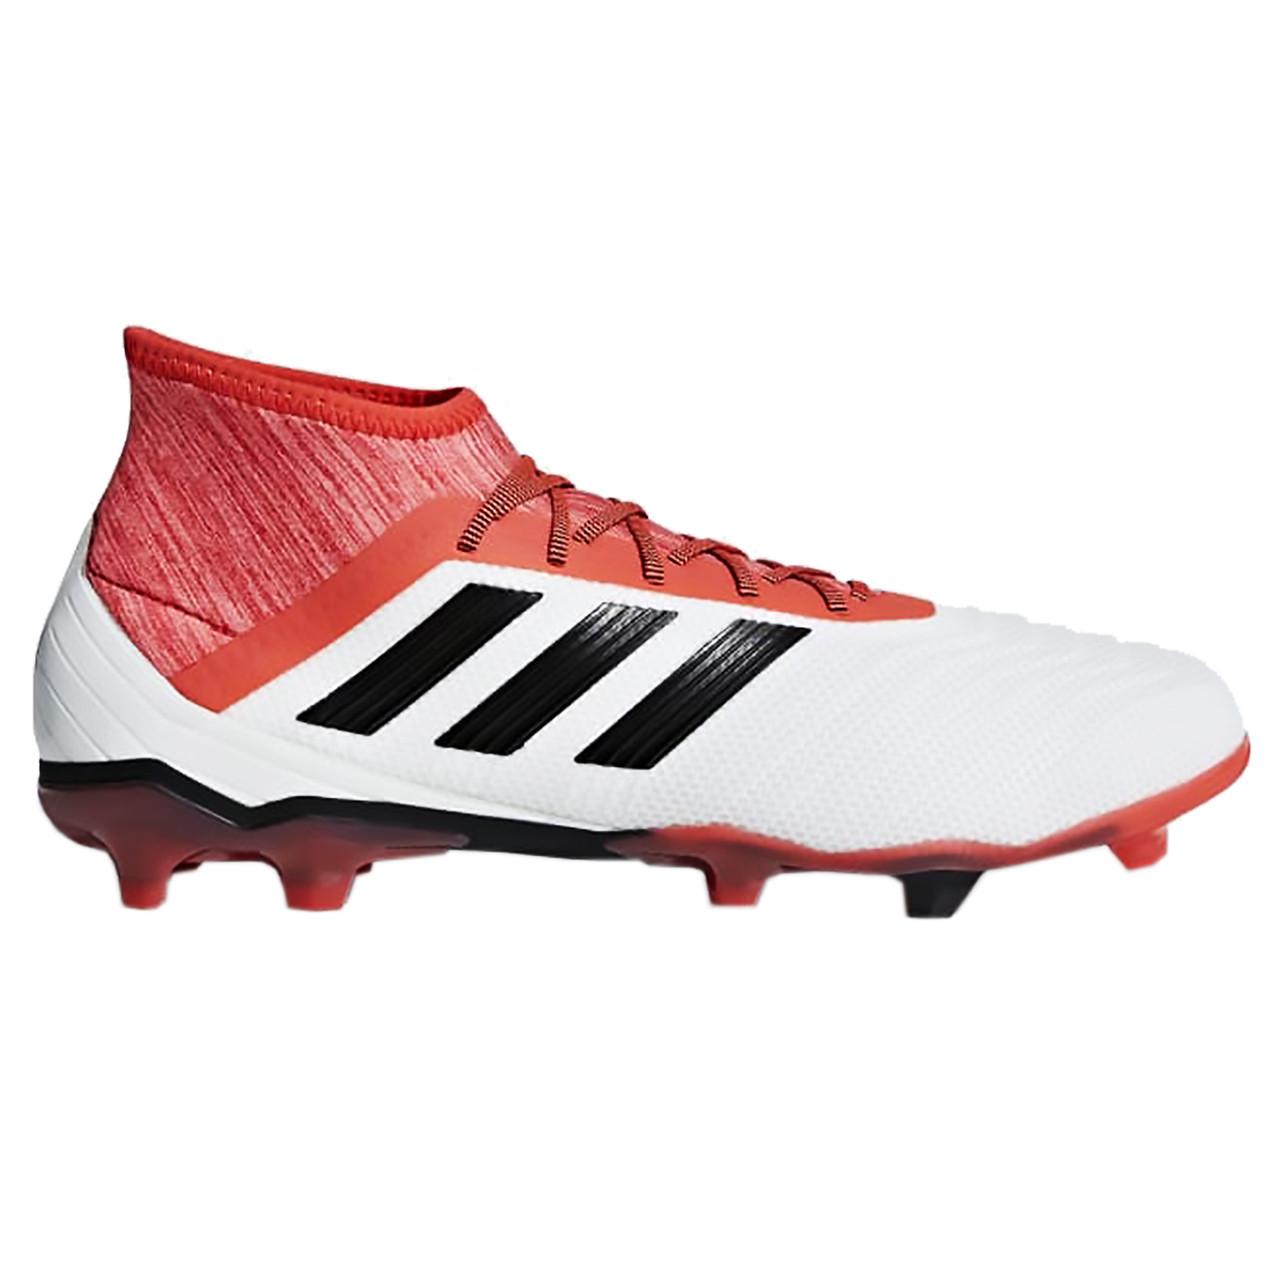 451876843 Adidas Predator 18.2 FG Men s Soccer Cleats CM7666 ...